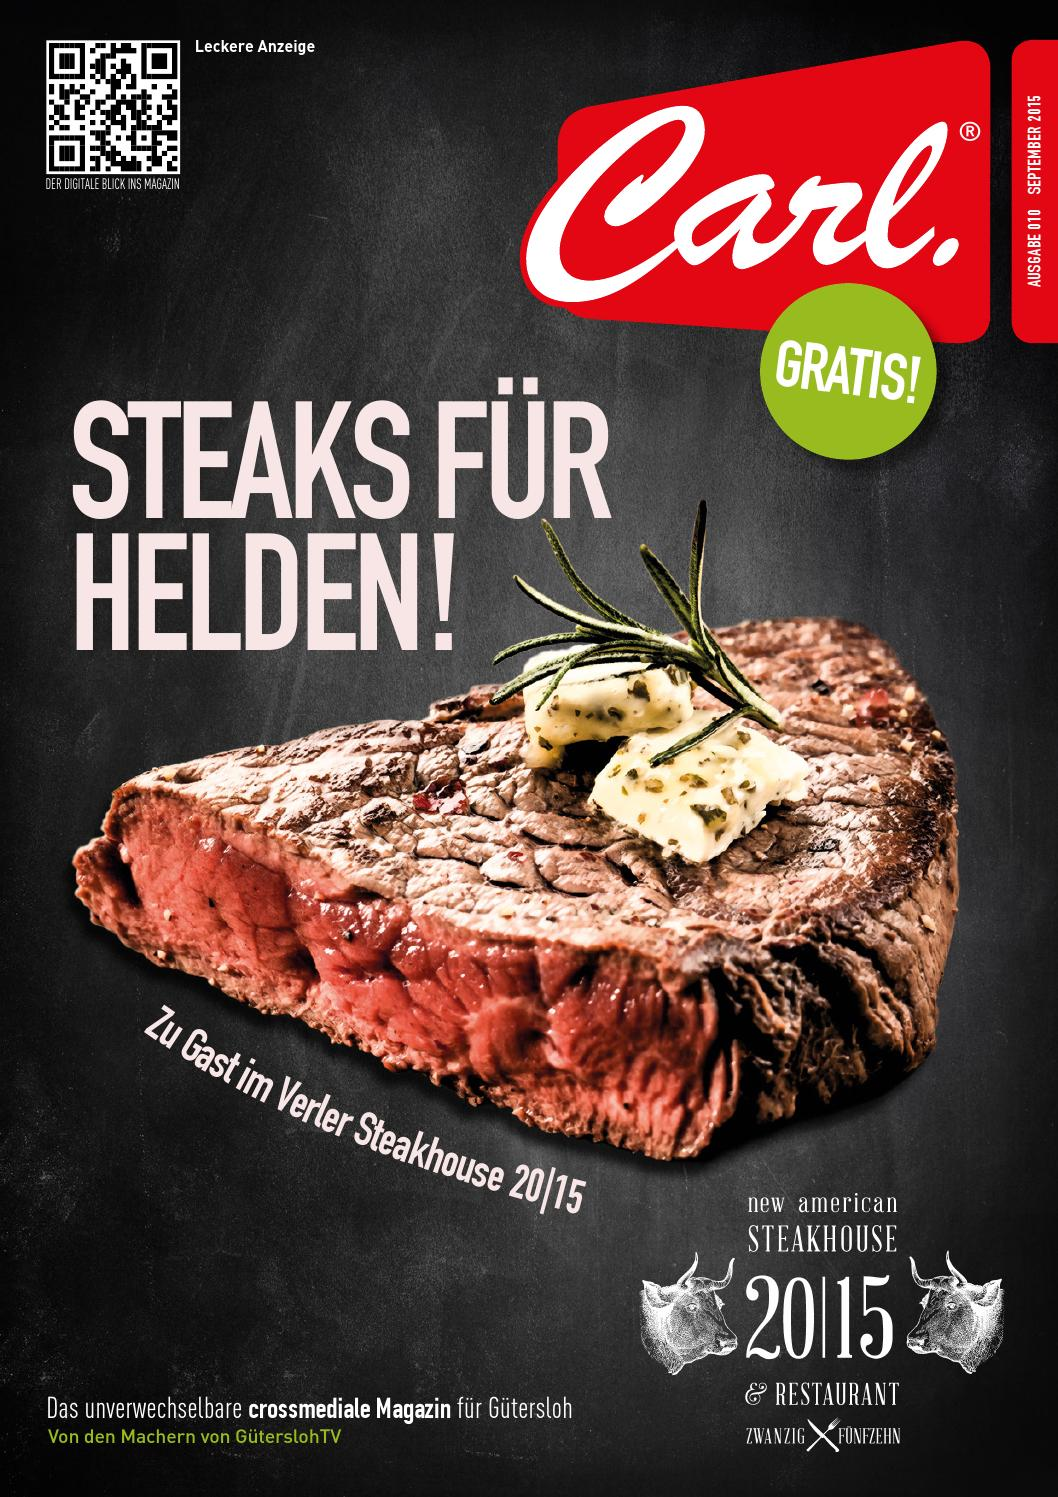 Carl 010 2015 By Guetersloh Tv - Issuu